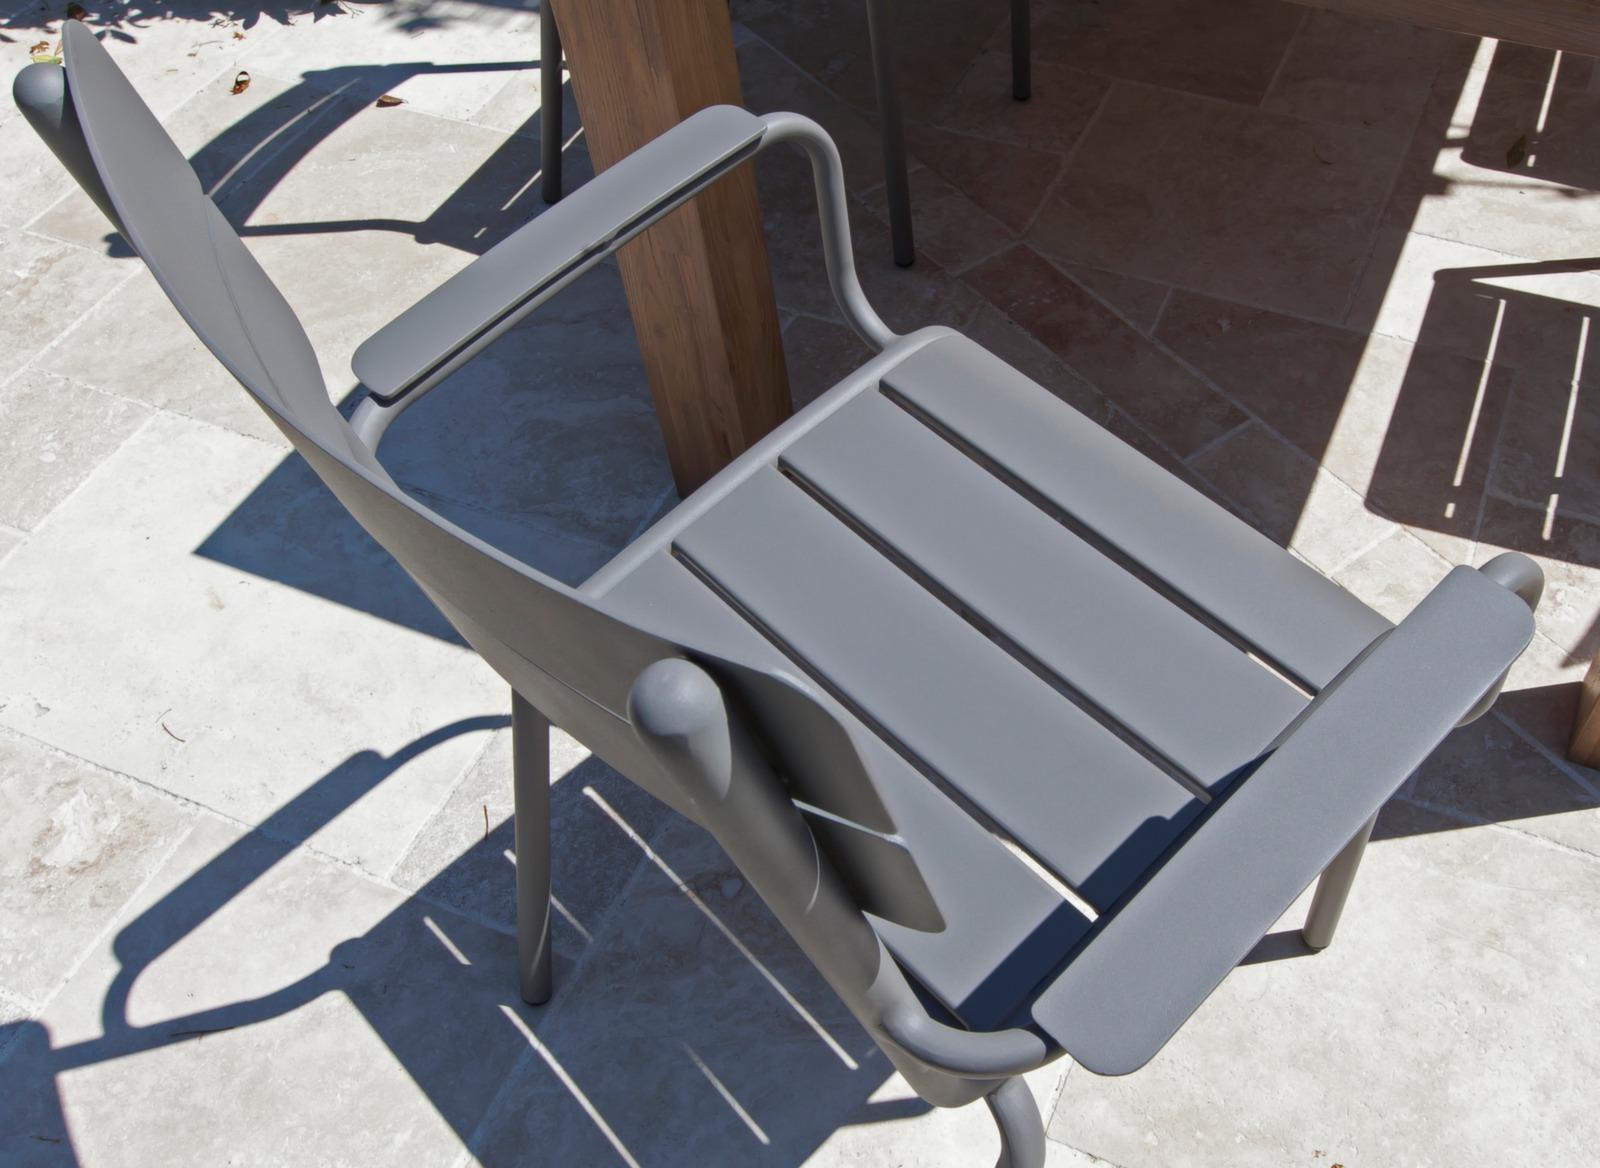 Jardin Fauteuil En De Proloisirs Aluminium Style Ecole Mobilier 3JcTlKF1